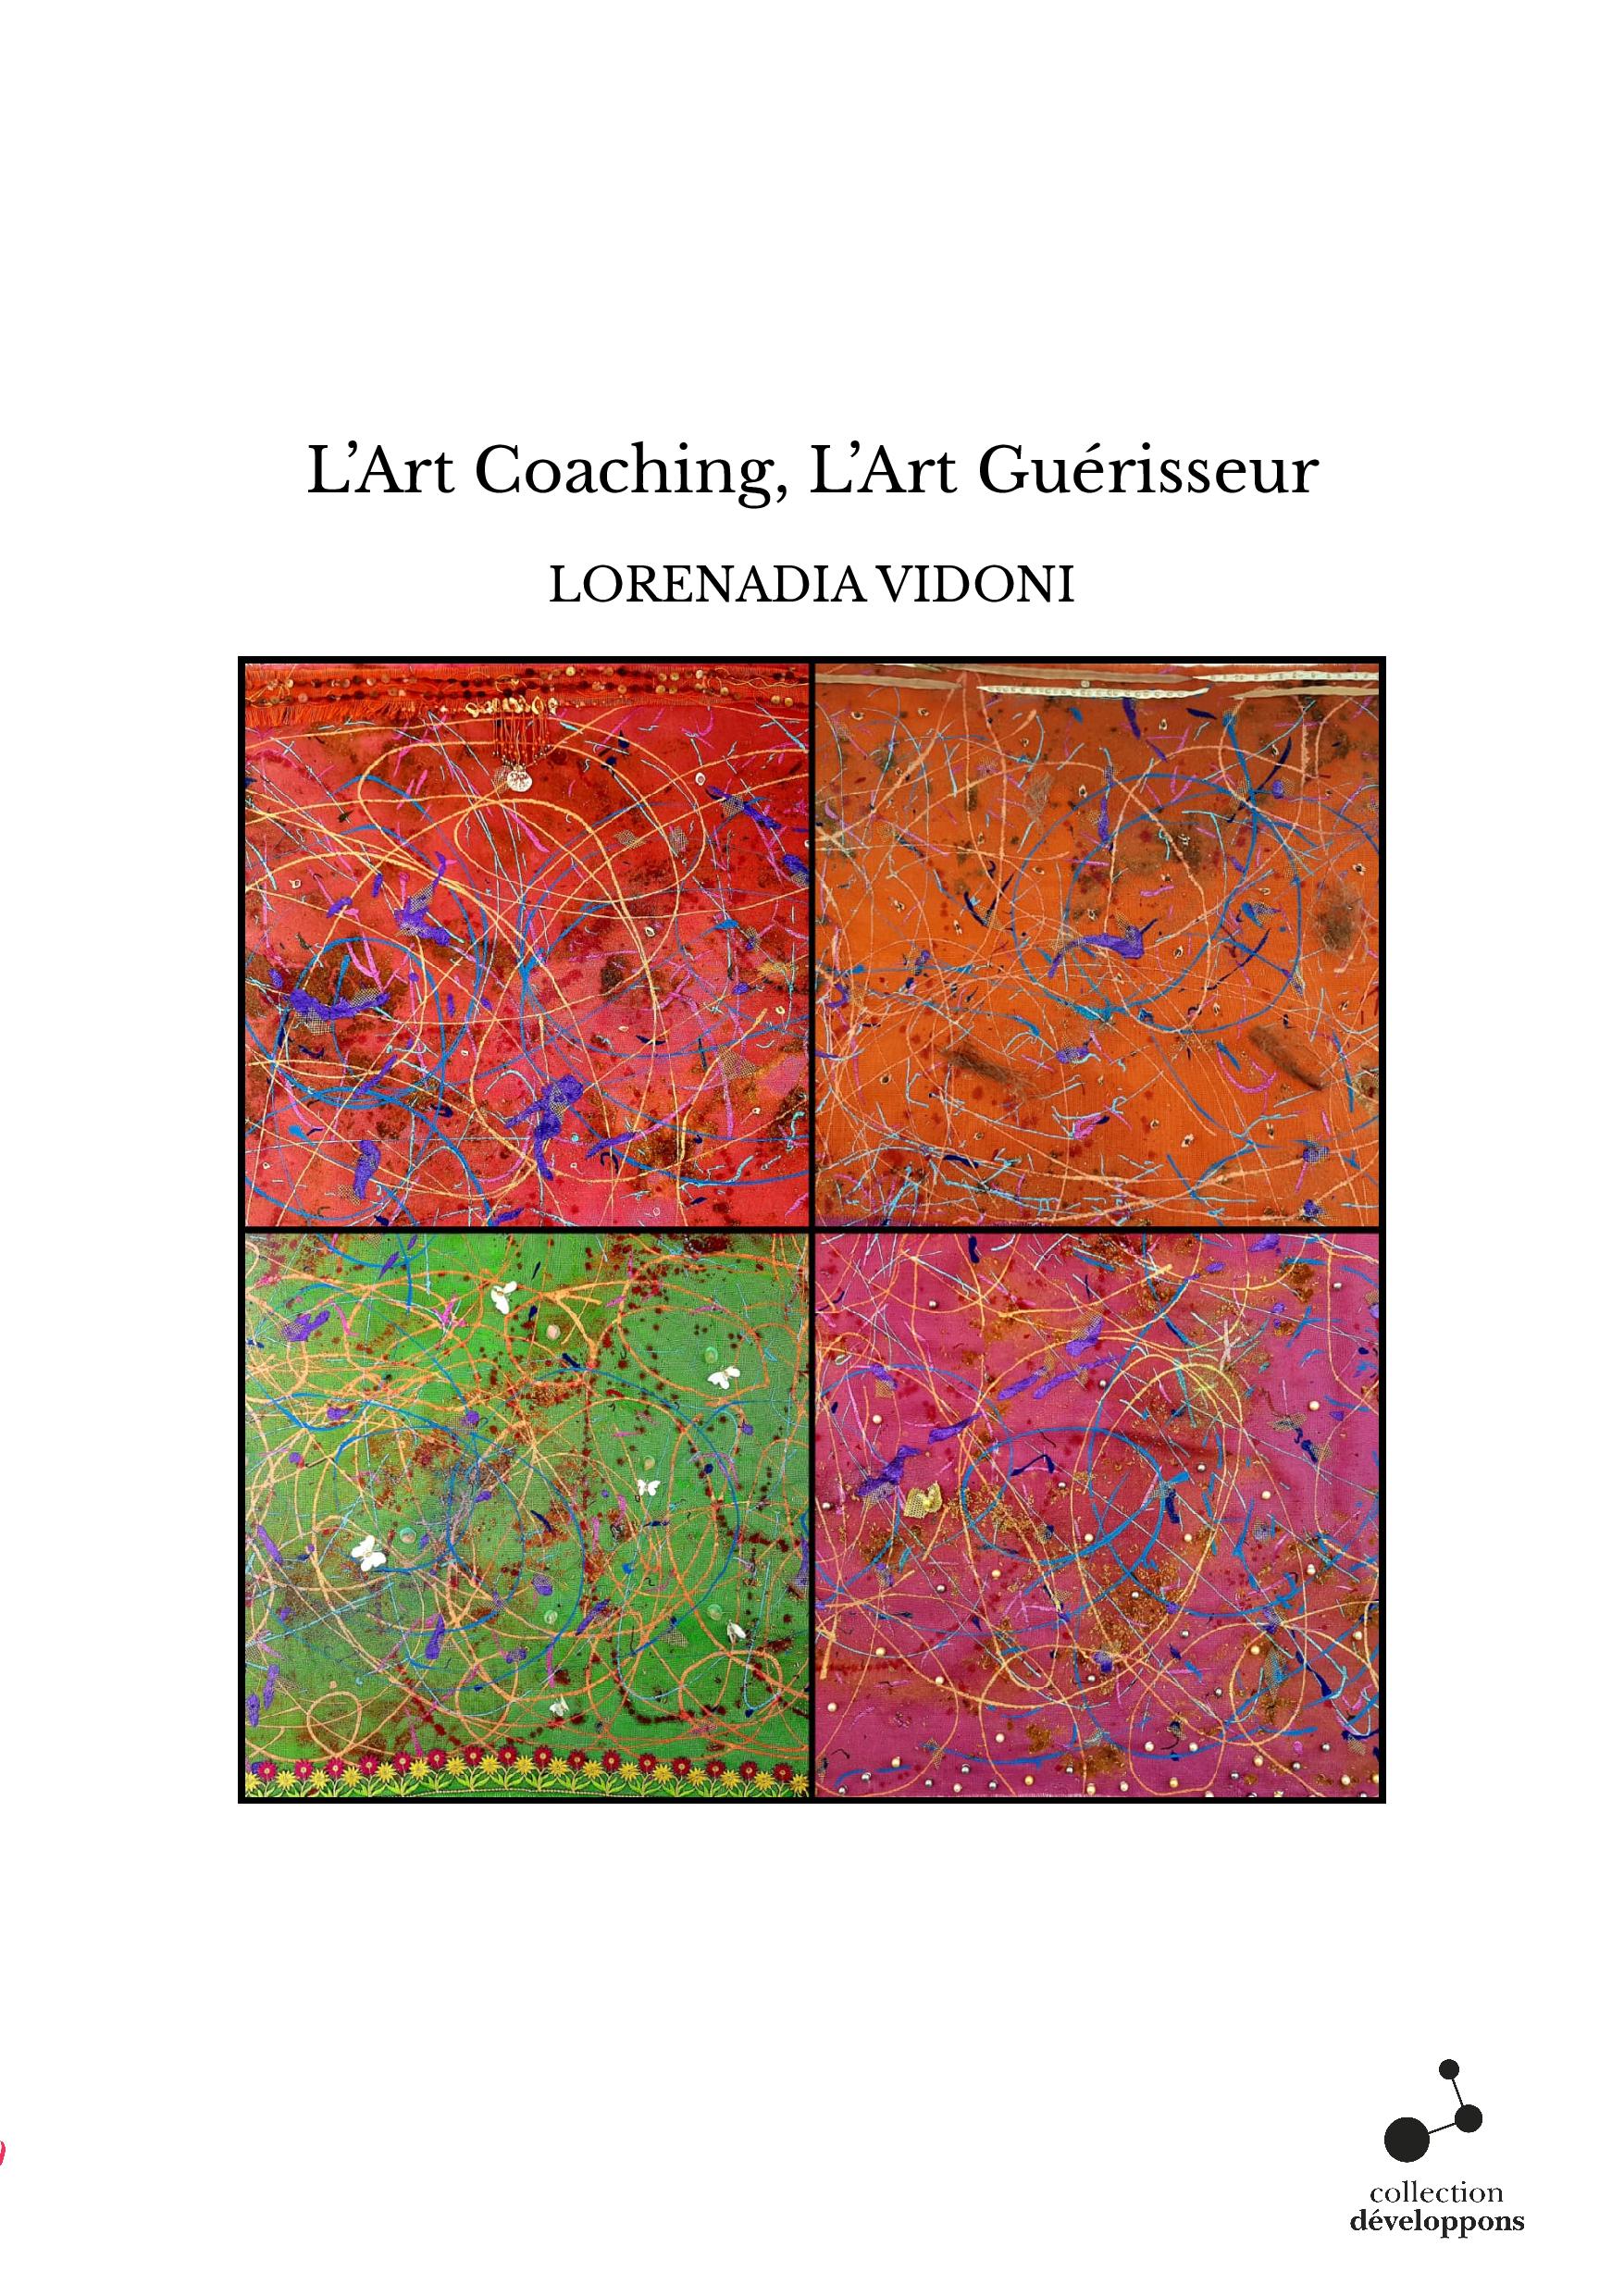 L'Art Coaching, L'Art Guérisseur